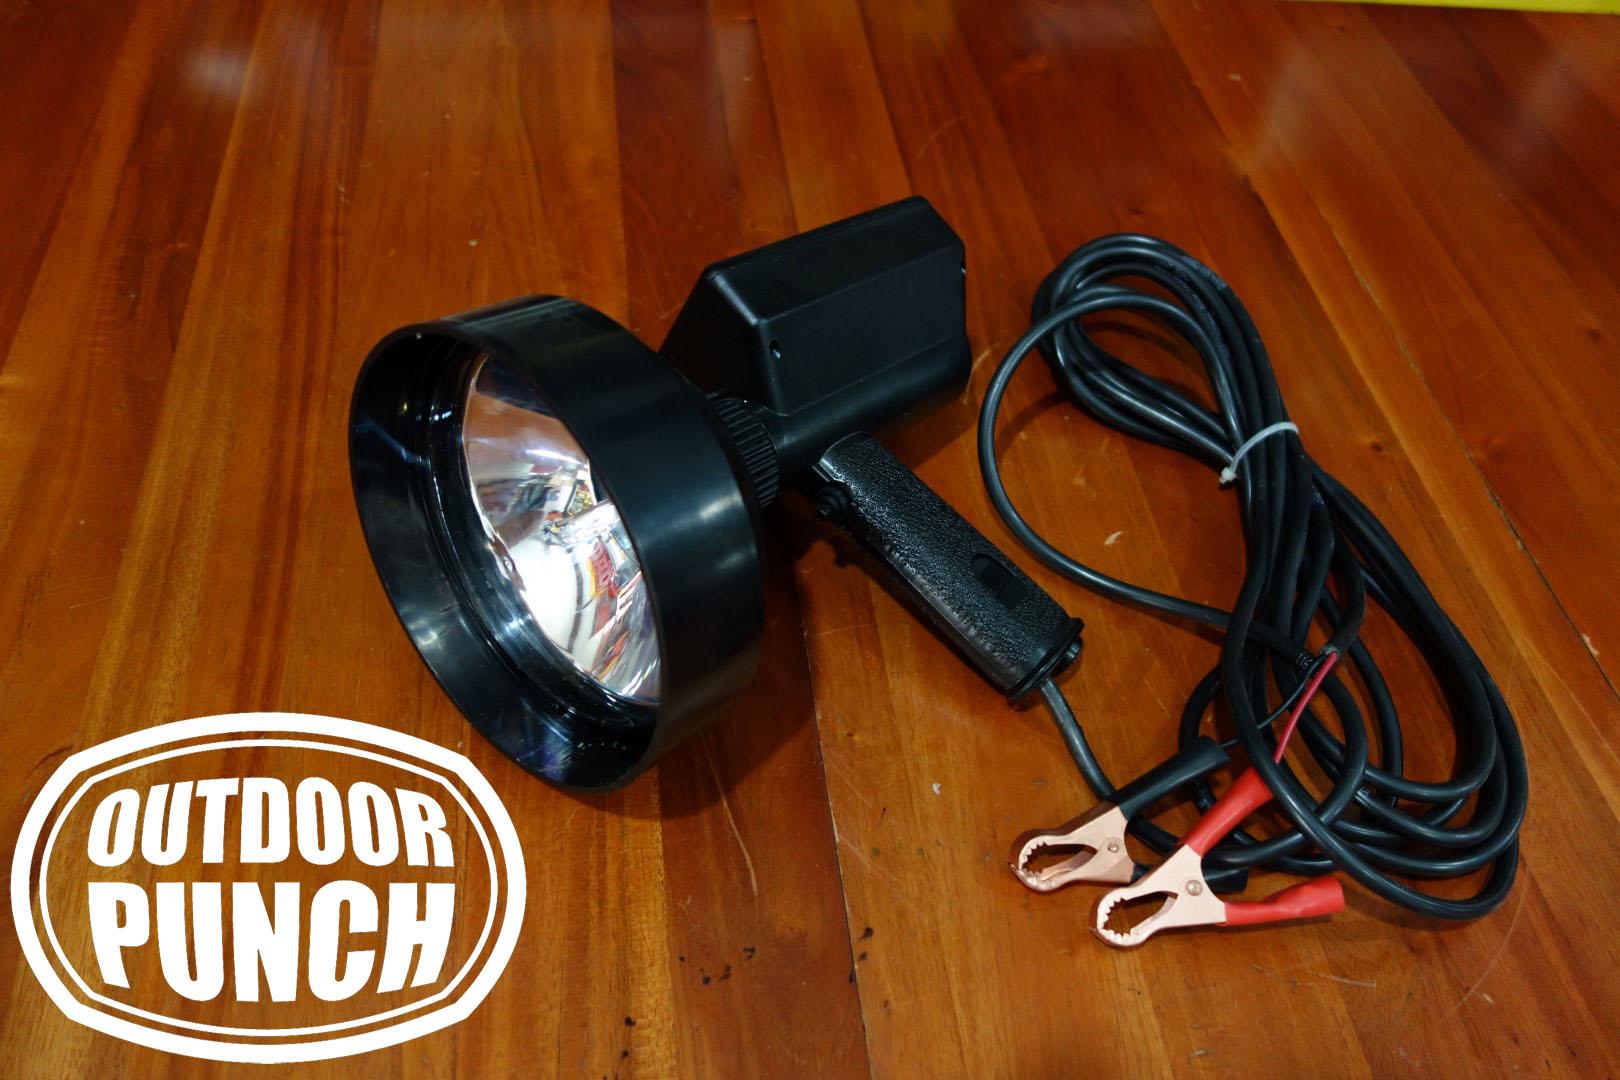 Hunting Spotlight HID Crocodile Plug (Lampu Sorot Berburu)